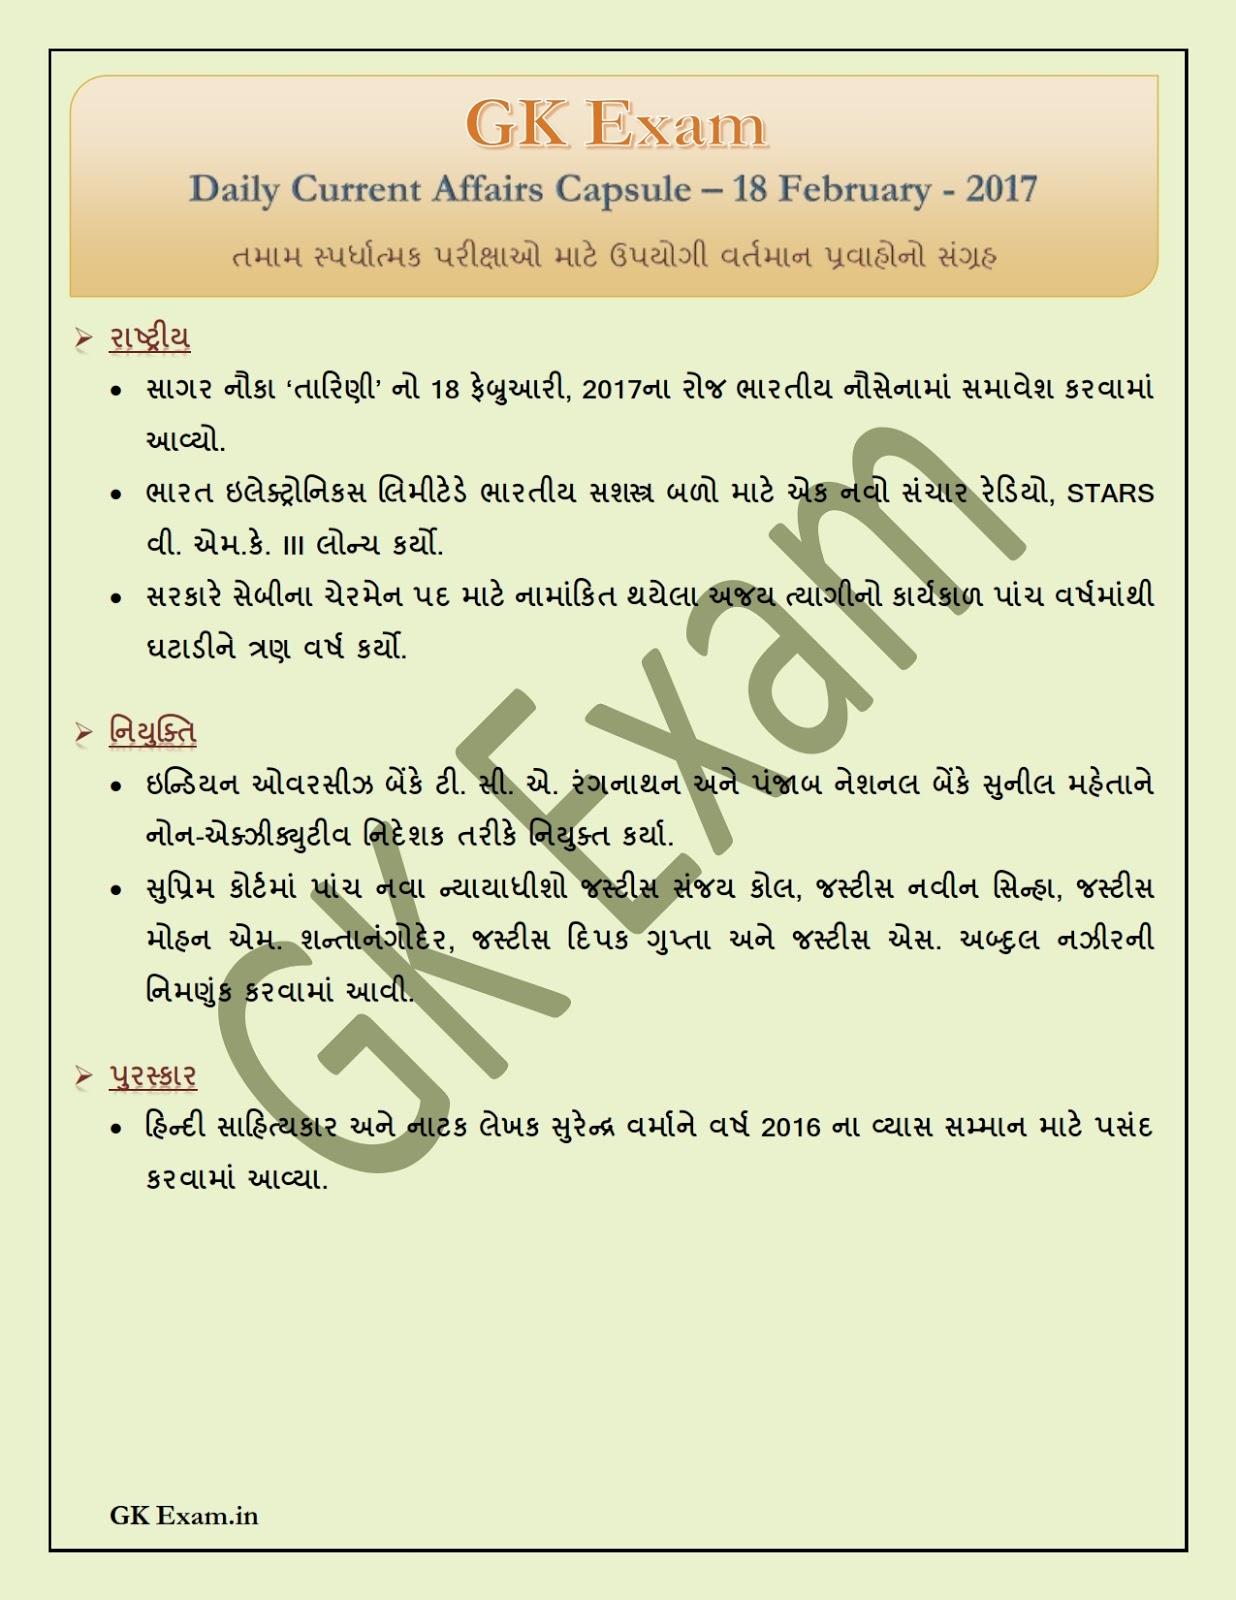 gujarat today epaper pdf download